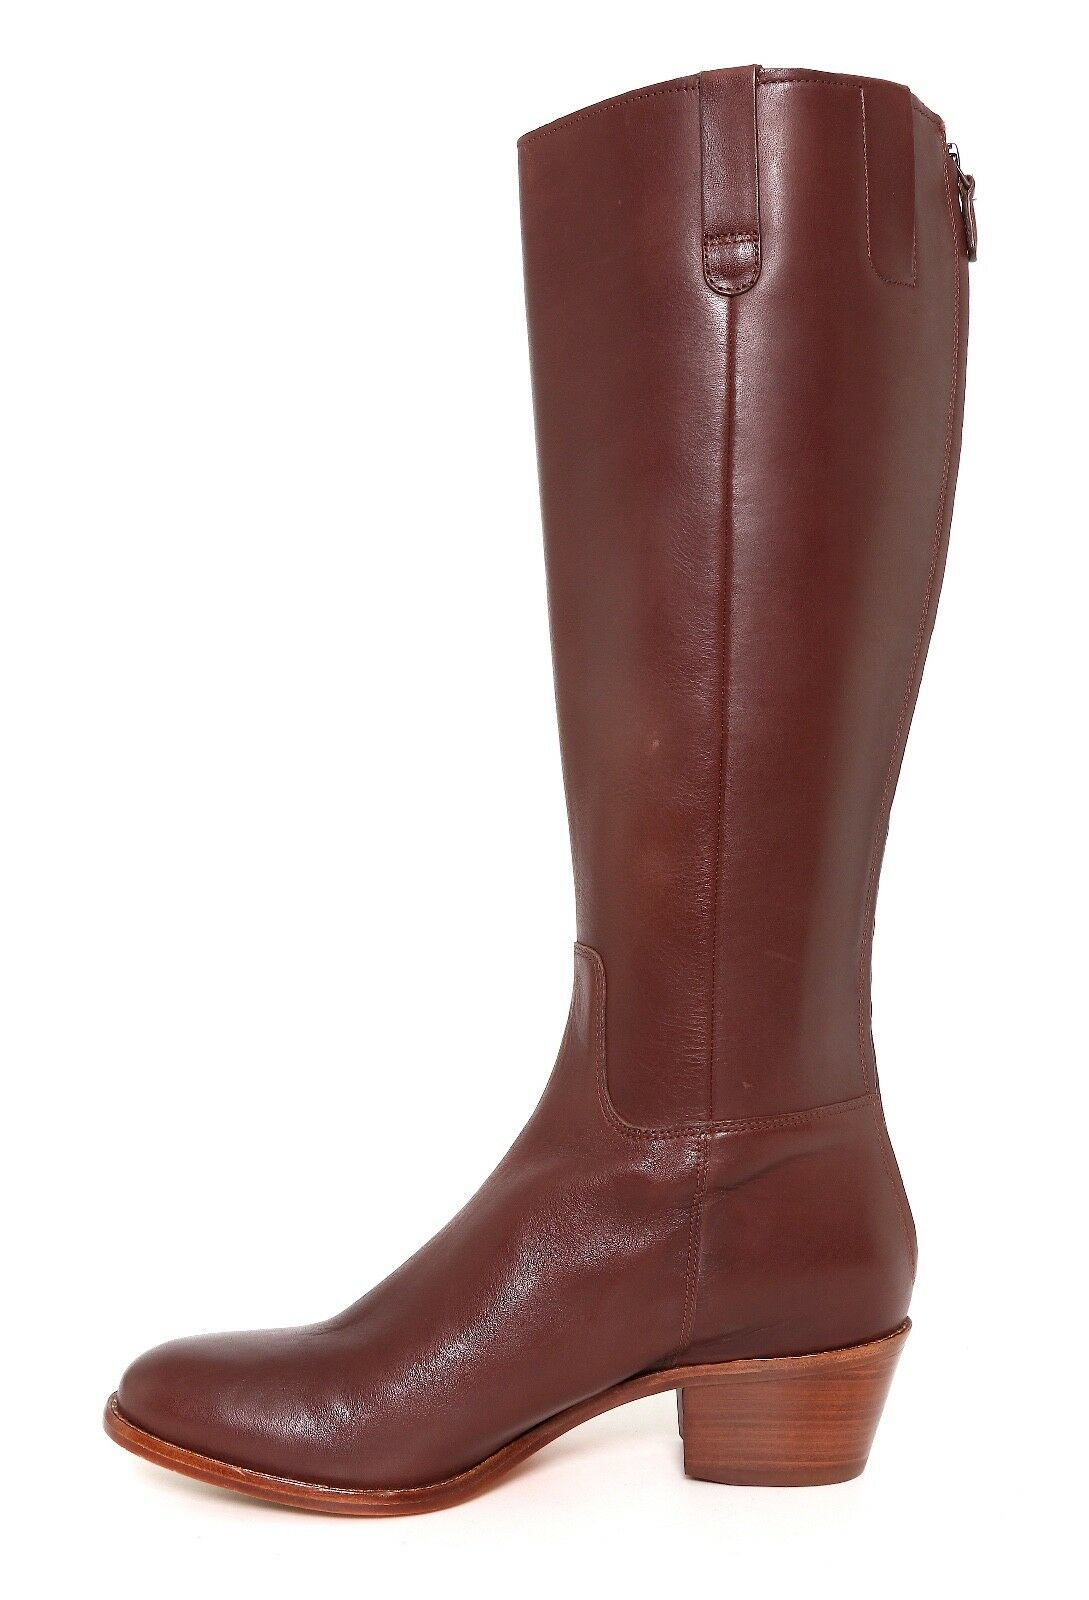 sconto online di vendita Cole Haan Wesley Leather Tall avvio Chestnut donna Sz Sz Sz 7 B 6676   prezzi bassi